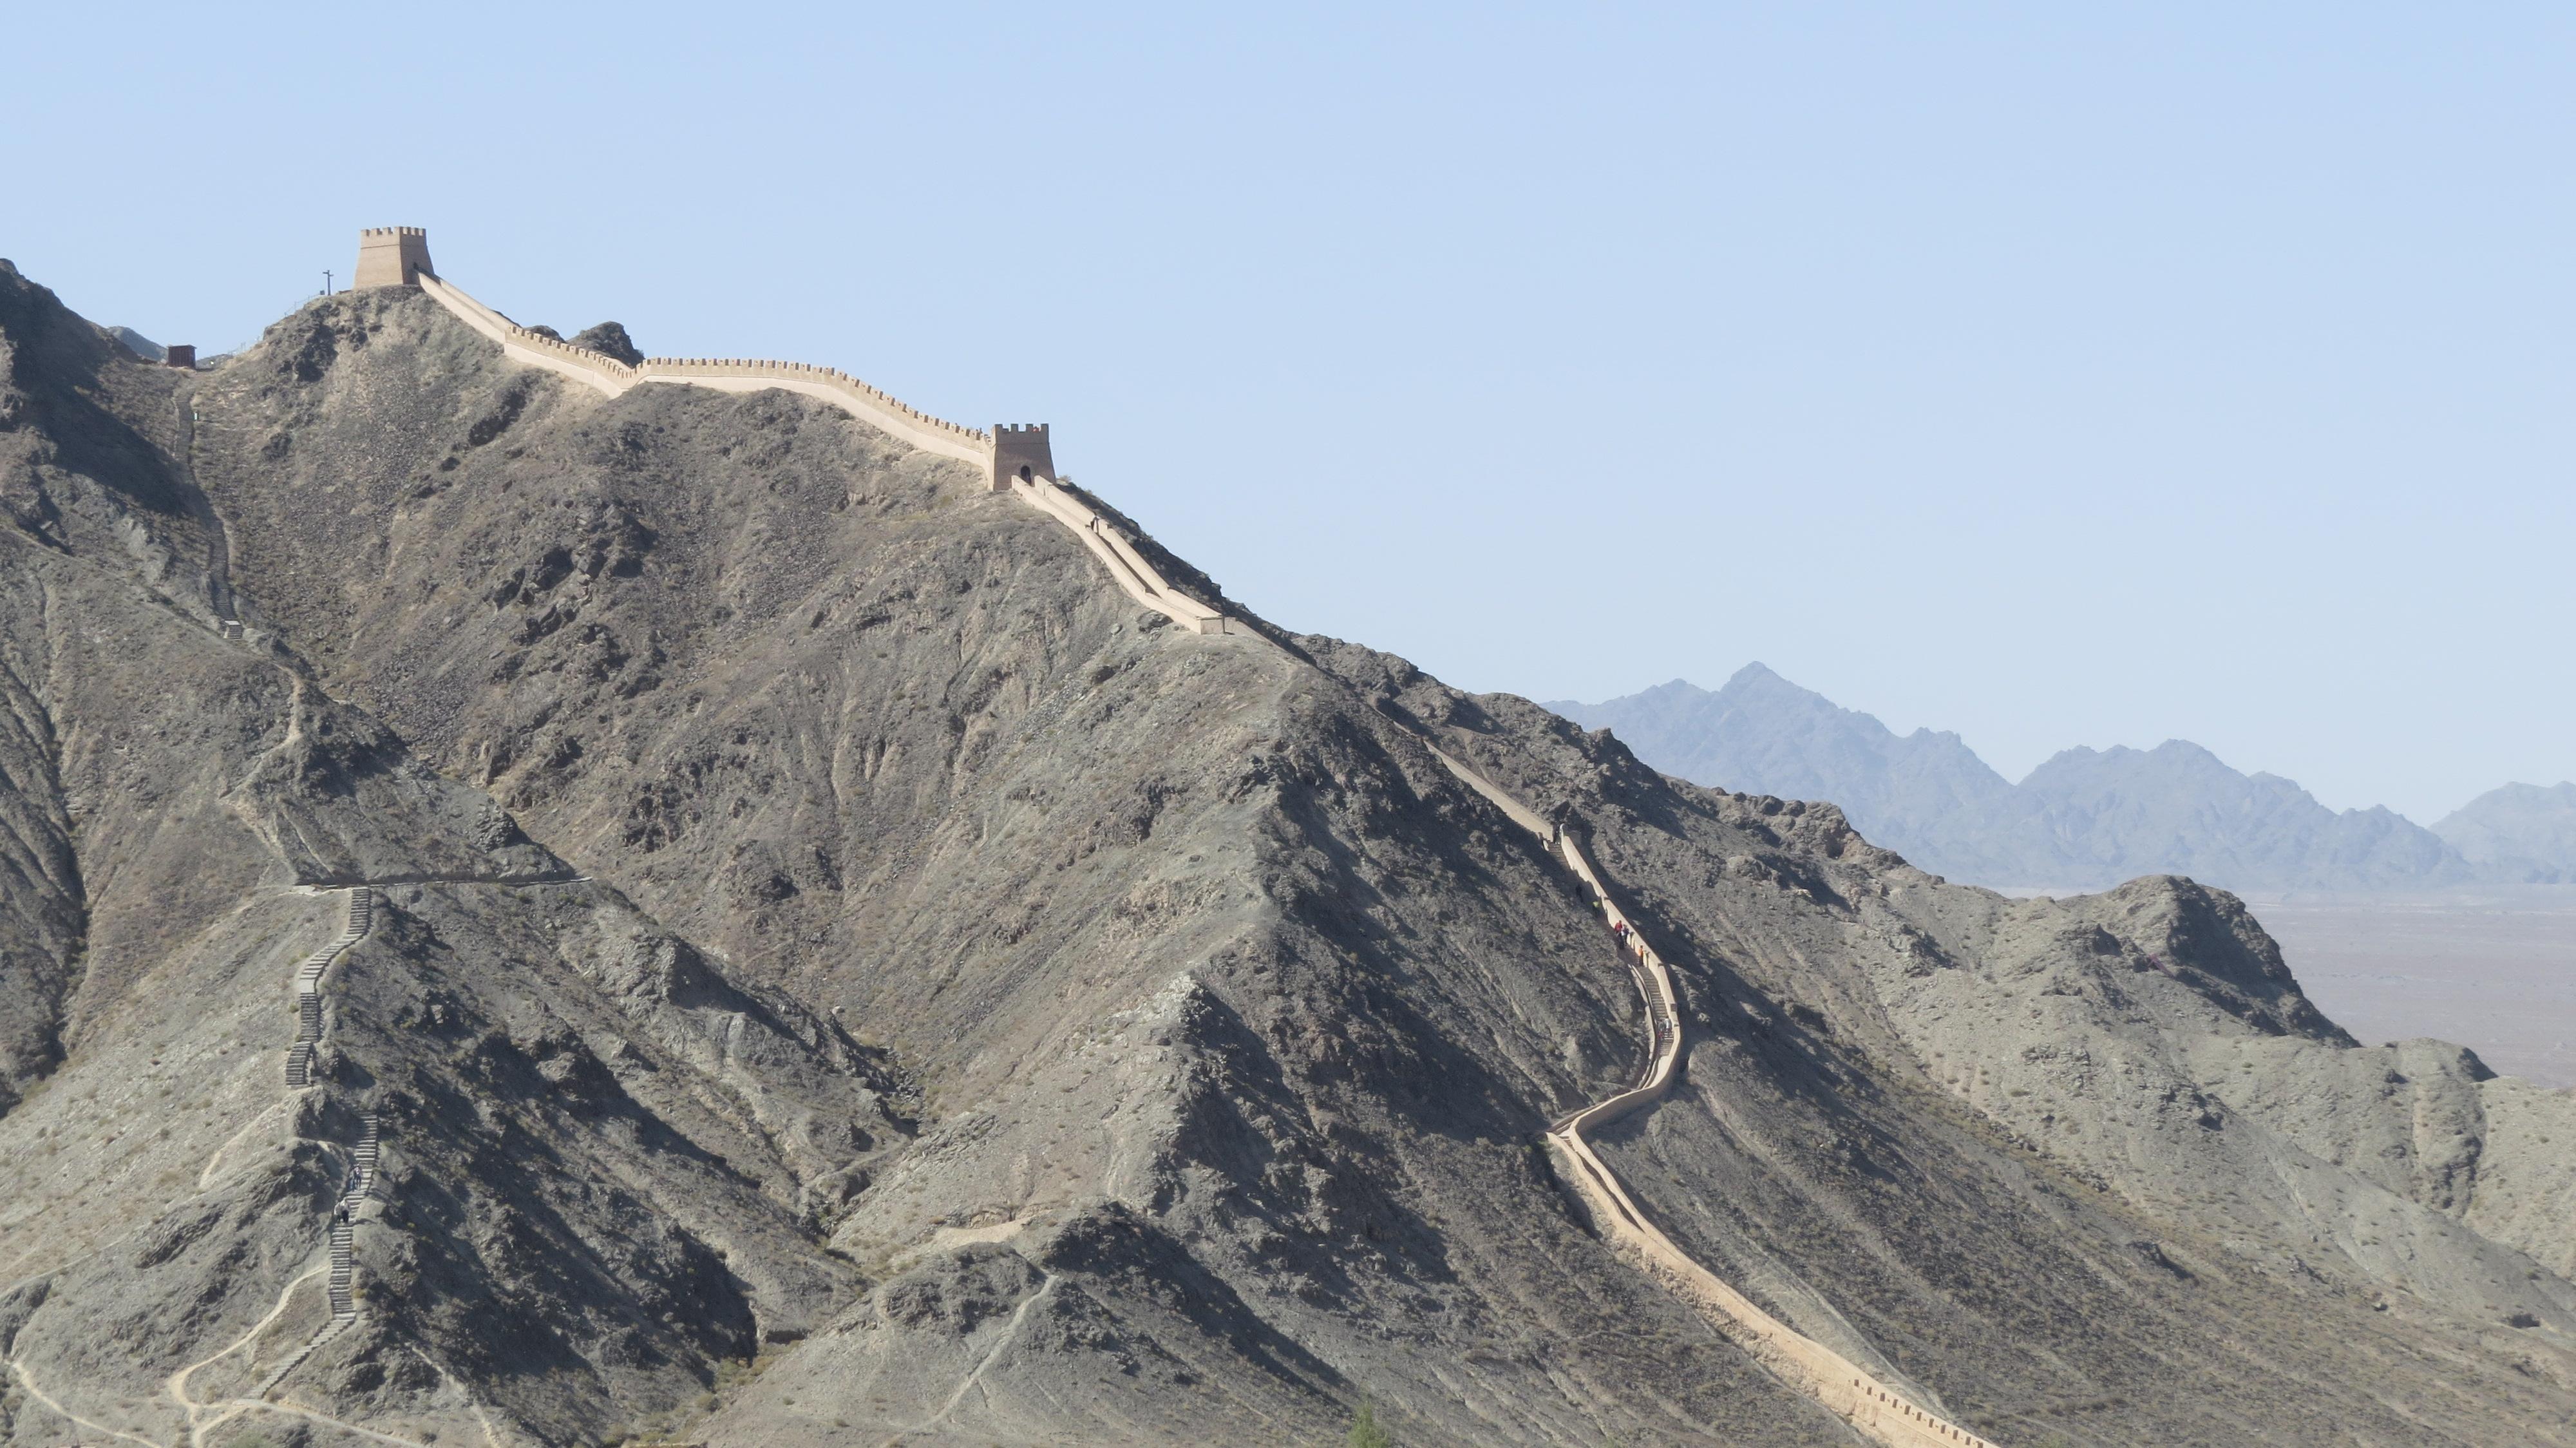 La Gran Muralla alternativa en China: Jiayuguan